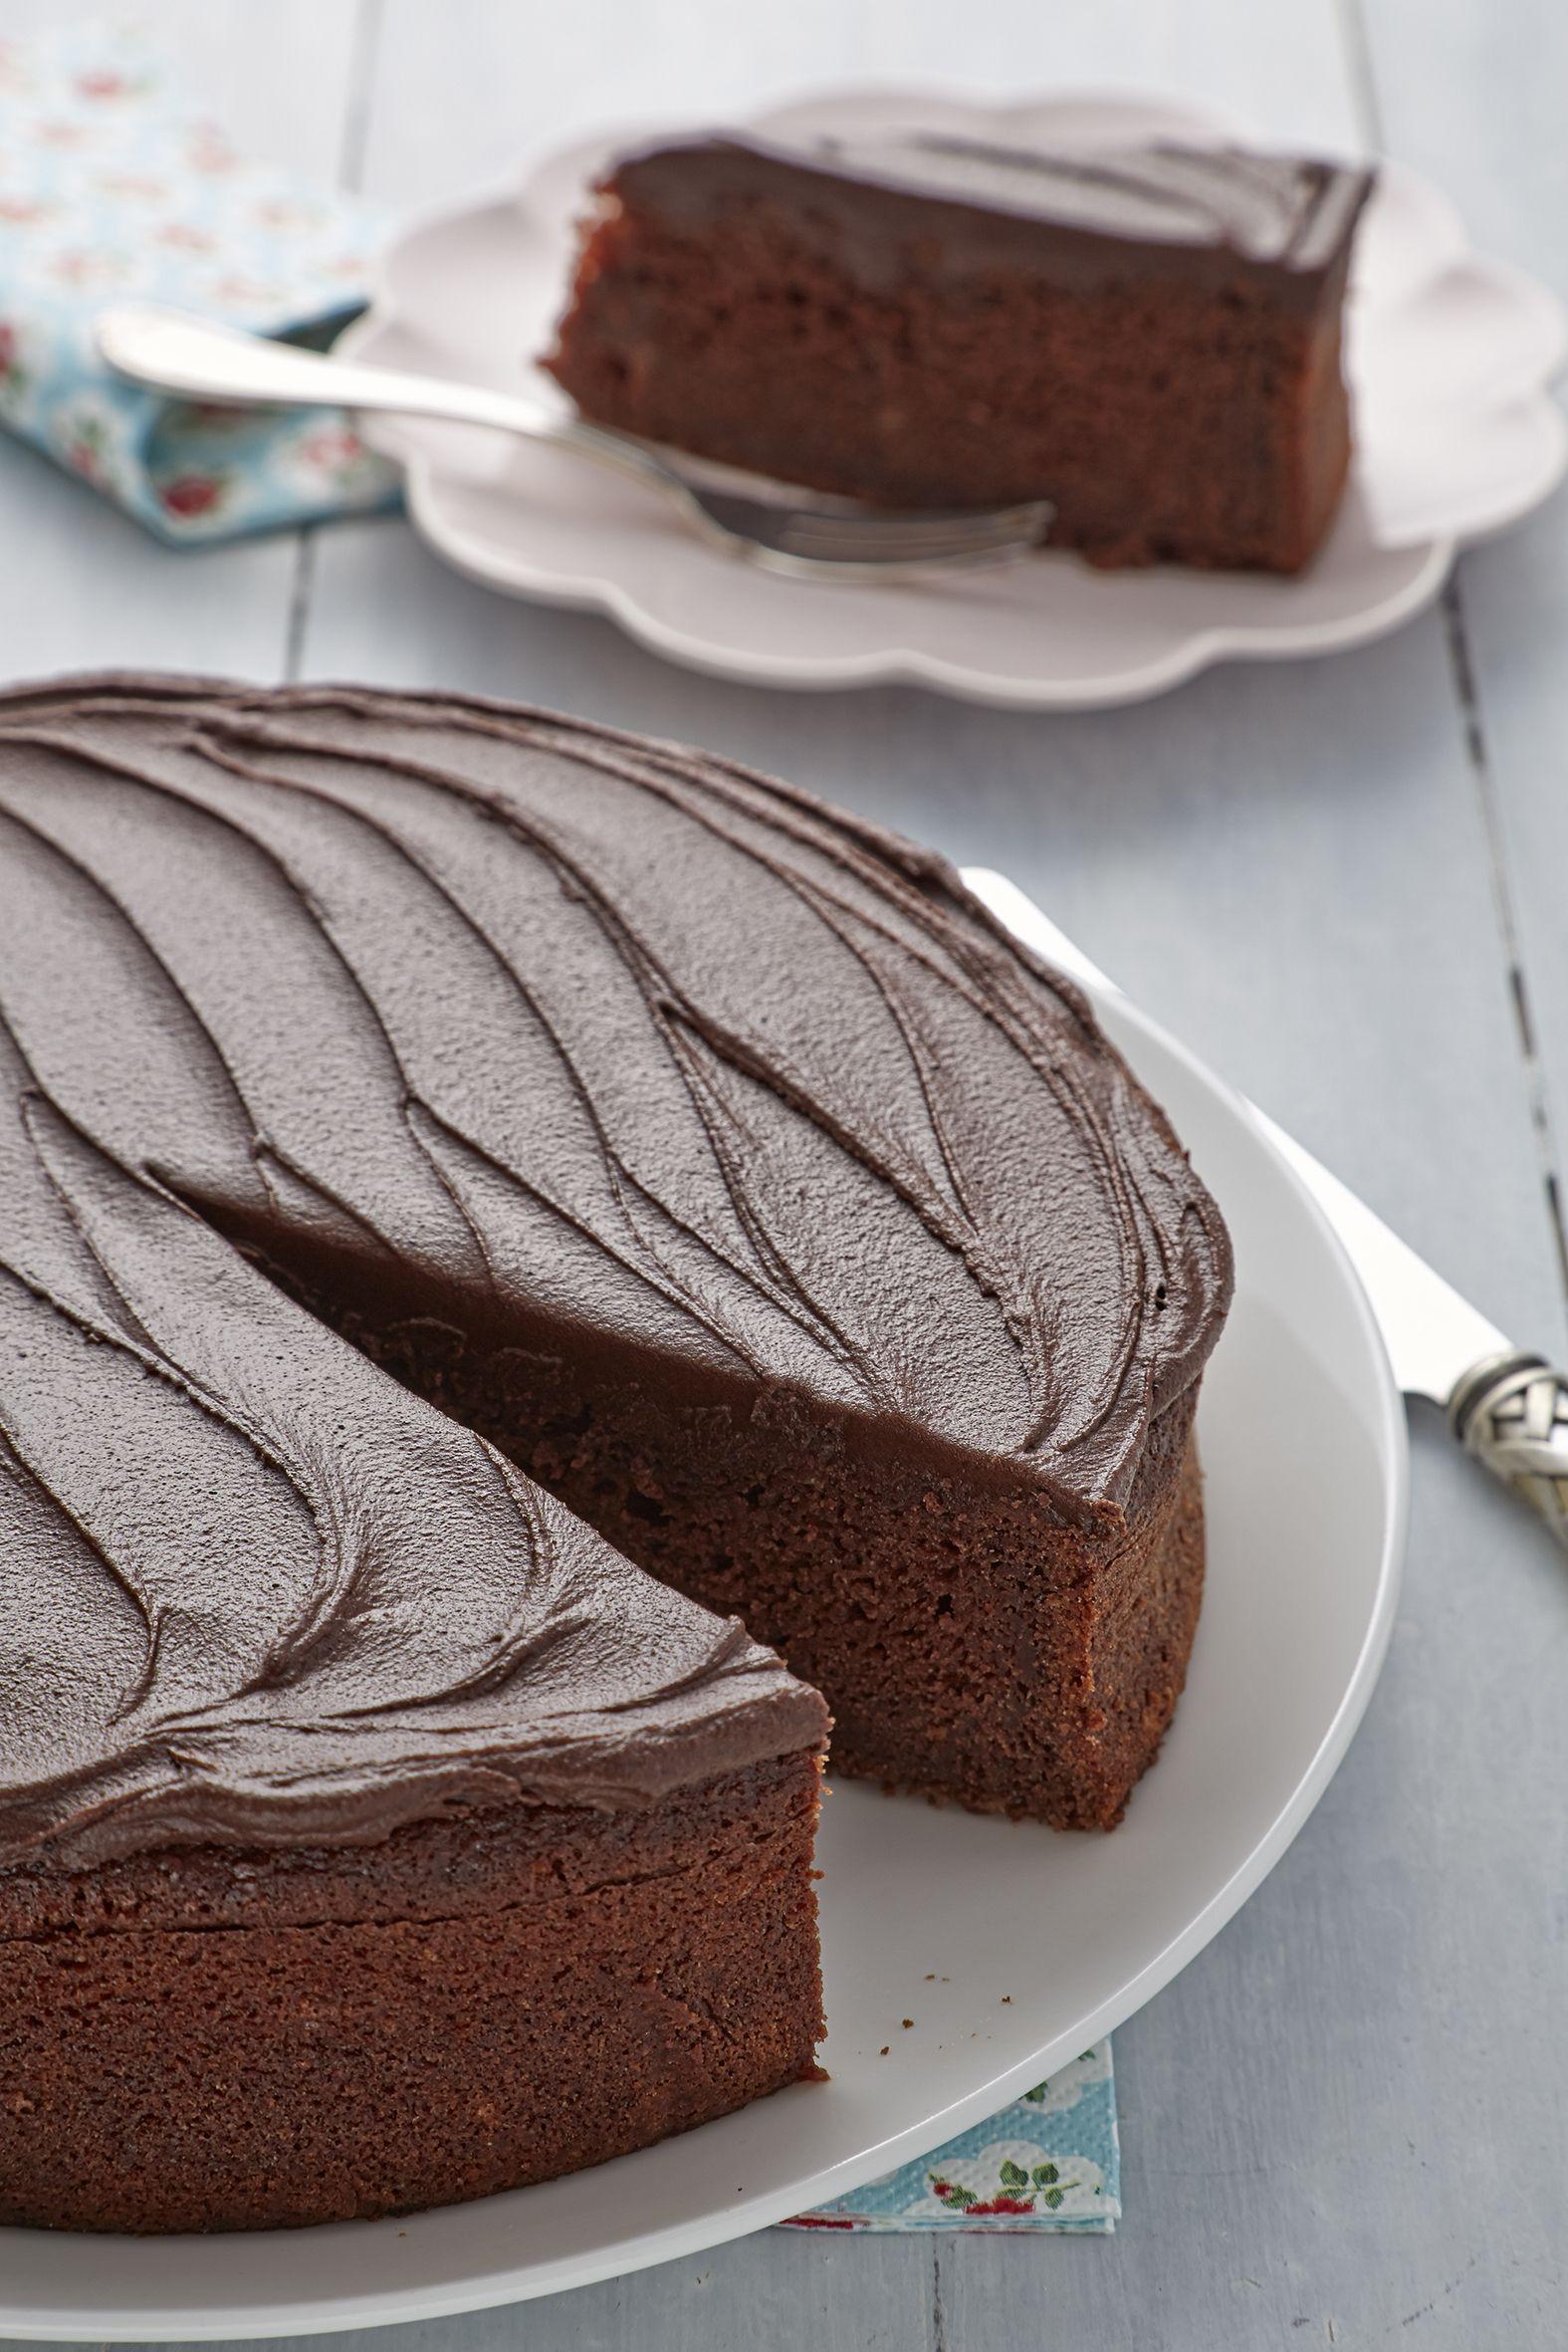 Edmonds Chocolate Cake recipe from SuperValue Cake